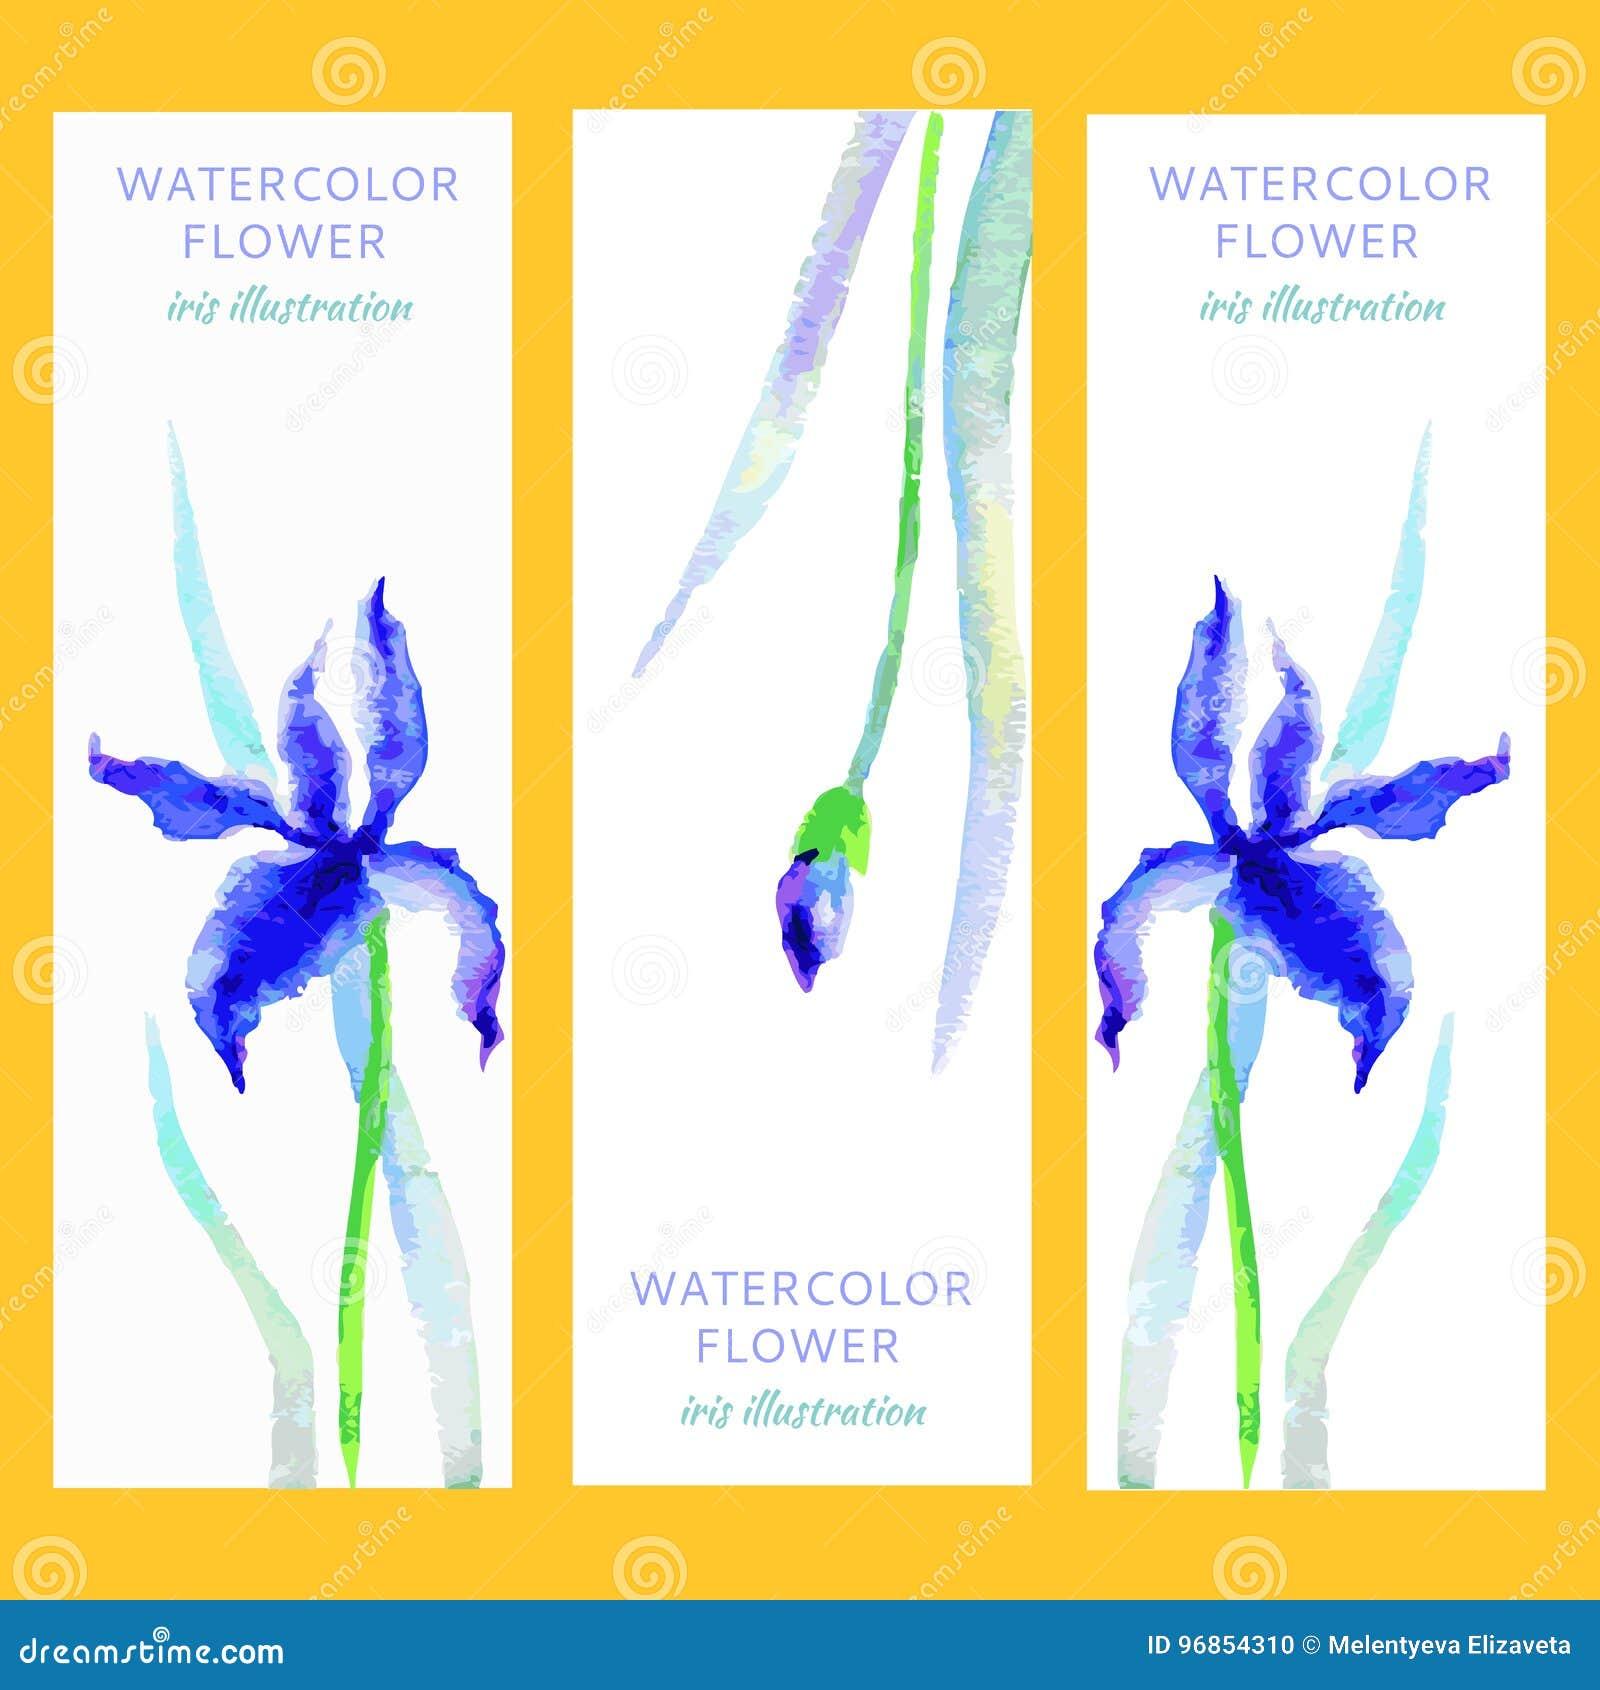 Blue iris flower border white background stock illustrations 40 blue iris flower border white background stock illustrations 40 blue iris flower border white background stock illustrations vectors clipart izmirmasajfo